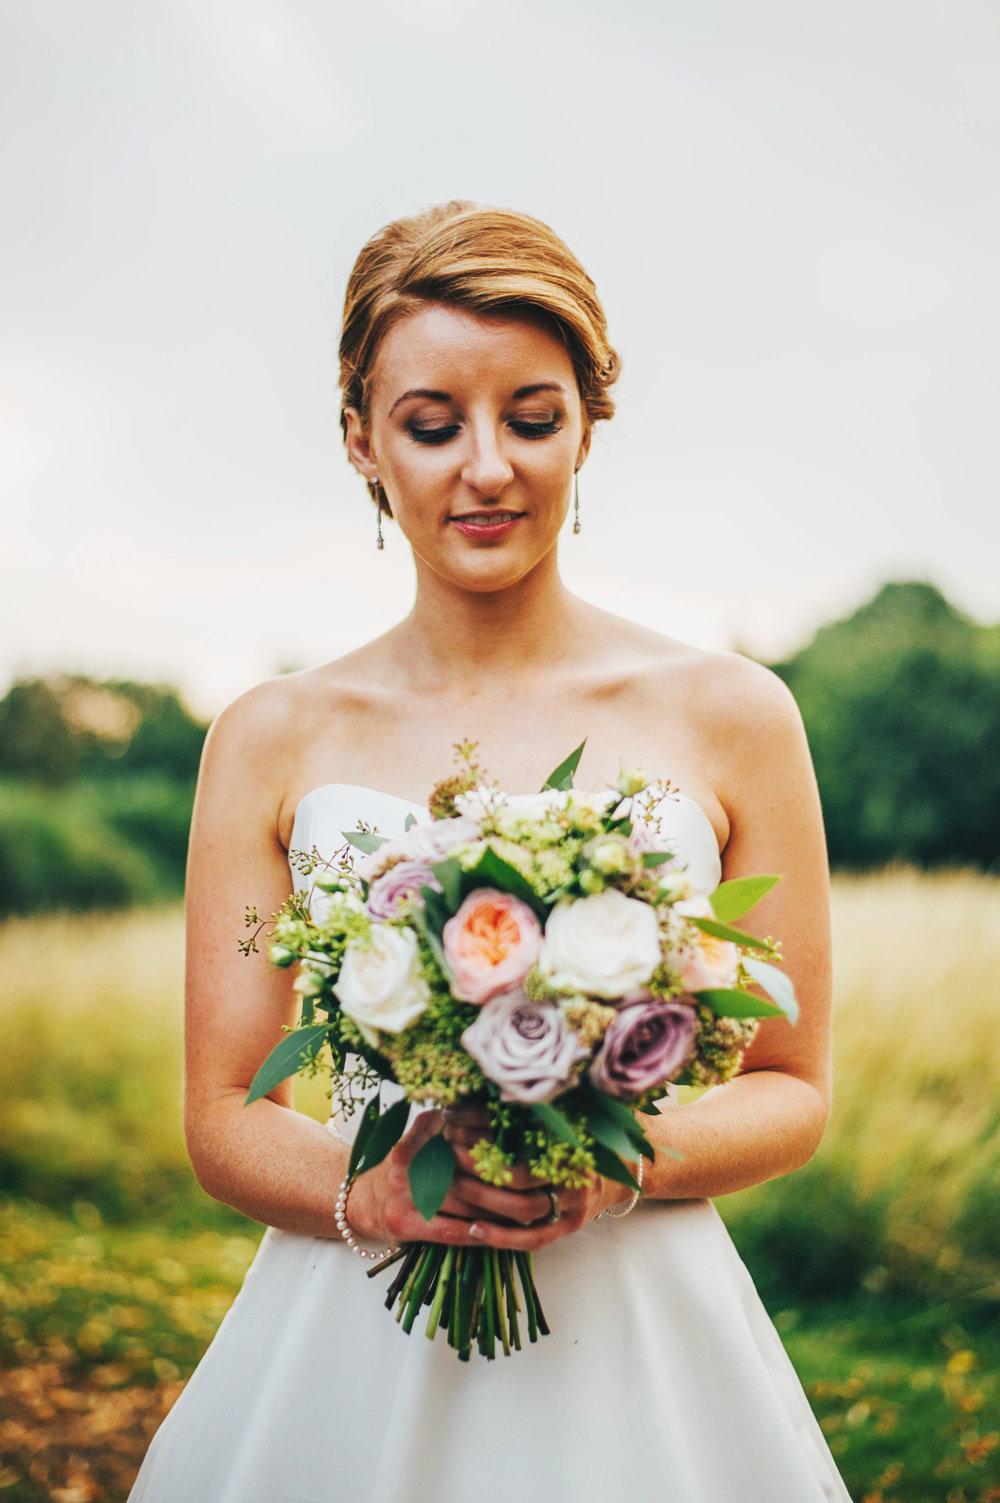 Bride in Pronovias for DIY Farm Wedding Essex UK Documentary Photographer